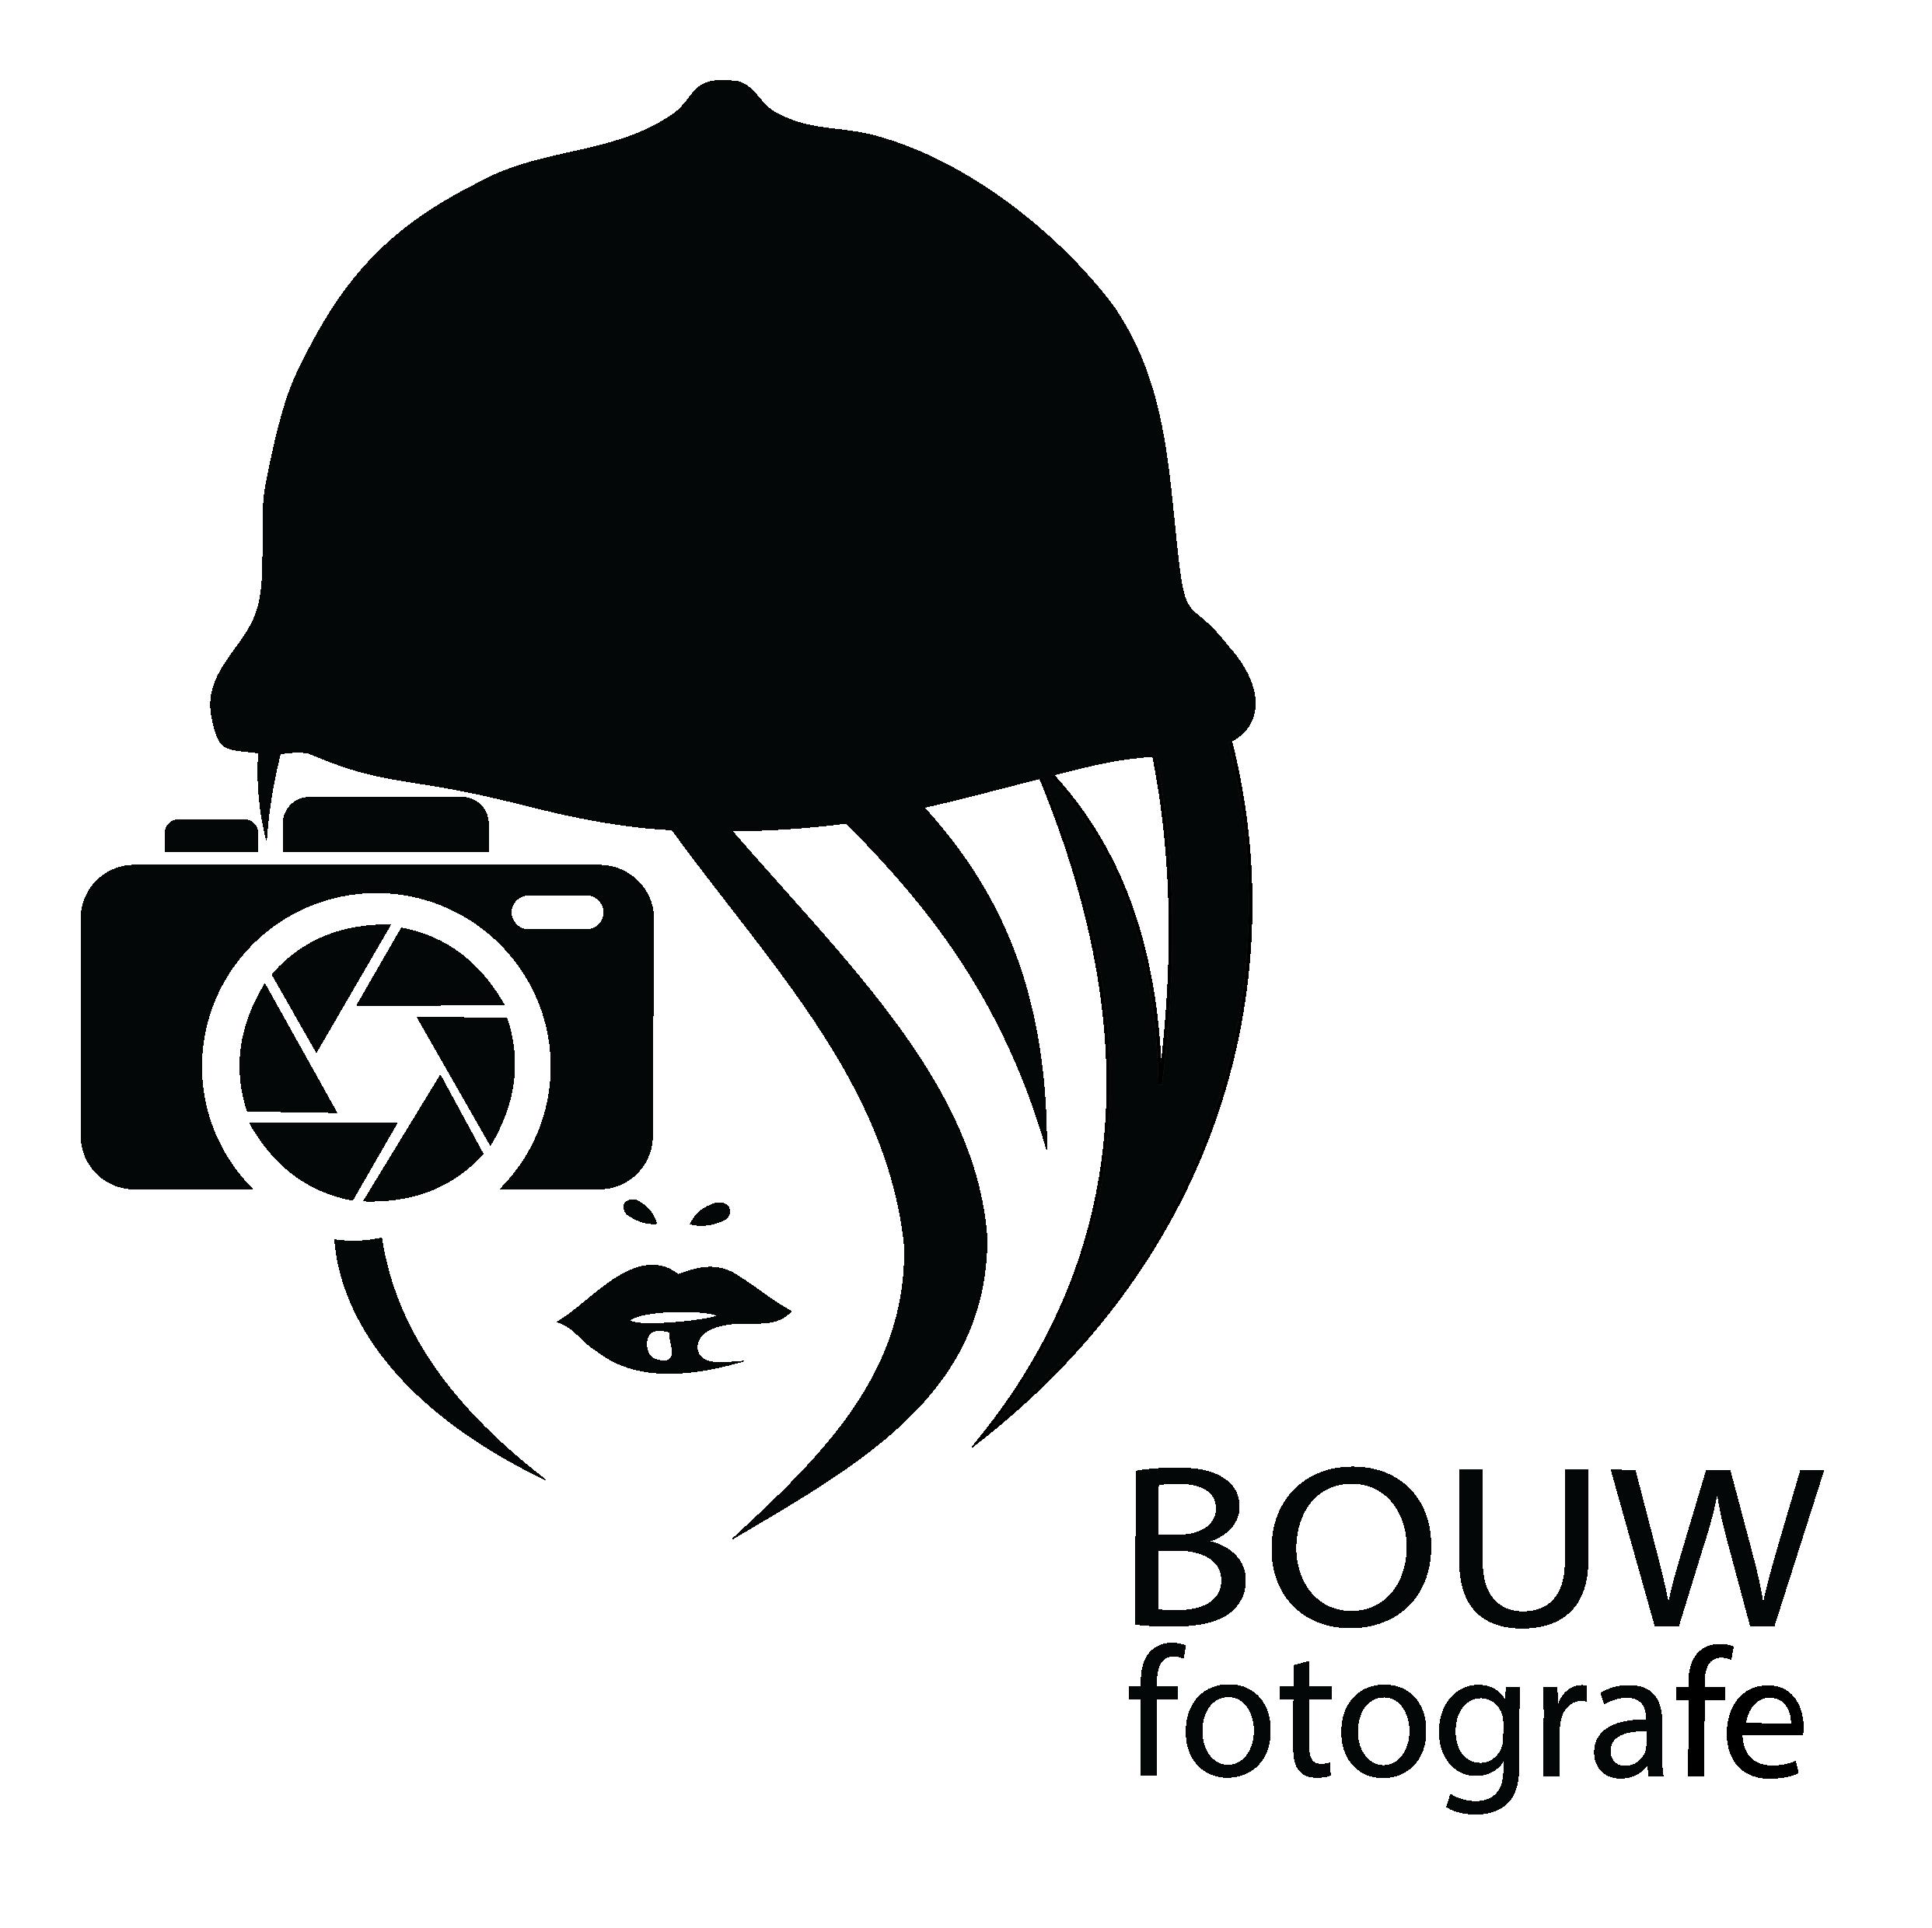 Bouwfotografe.nl